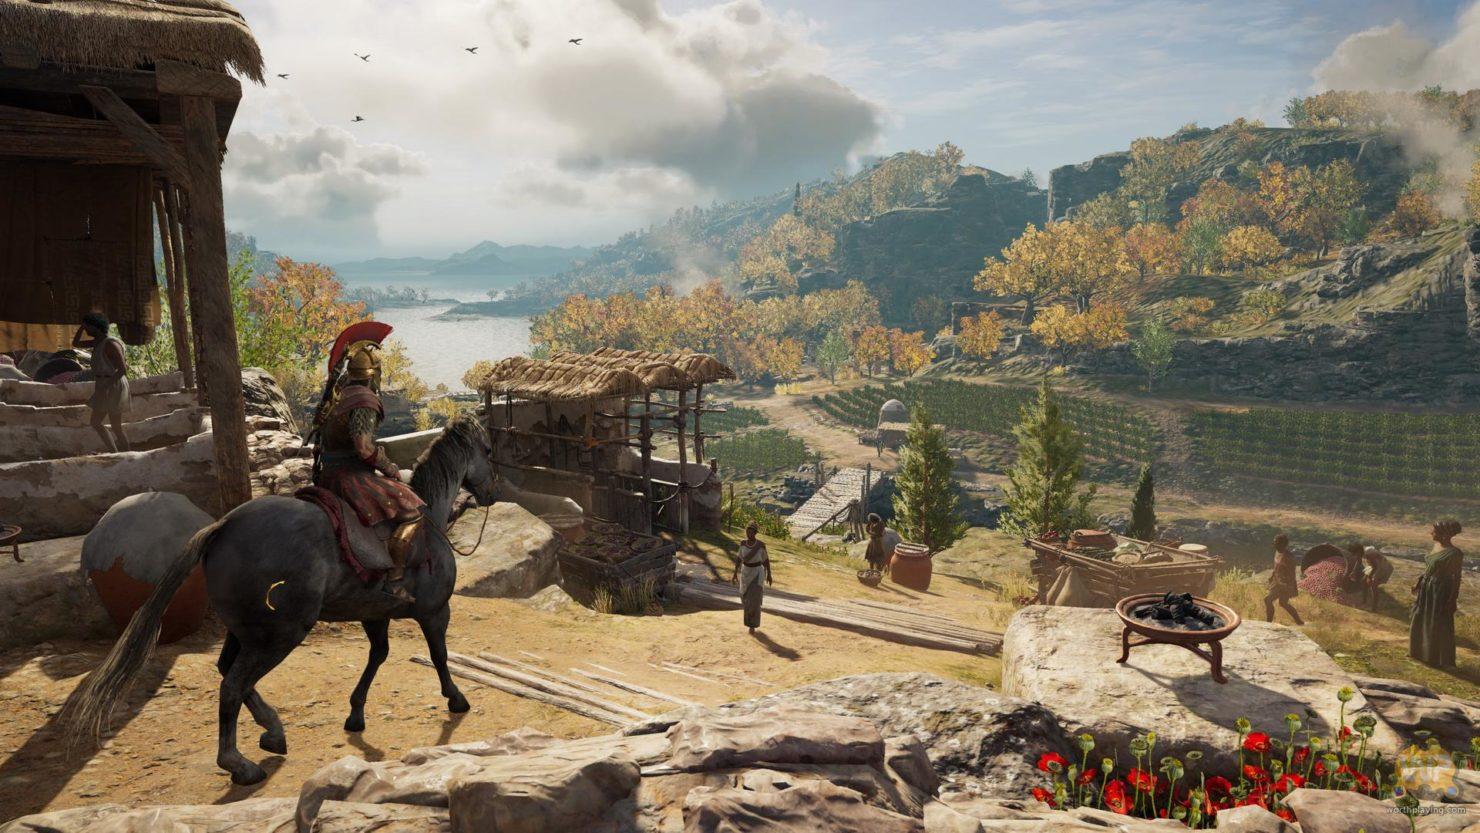 Assassin's Creed Odyssey Alexios à cheval devant vignes vertes